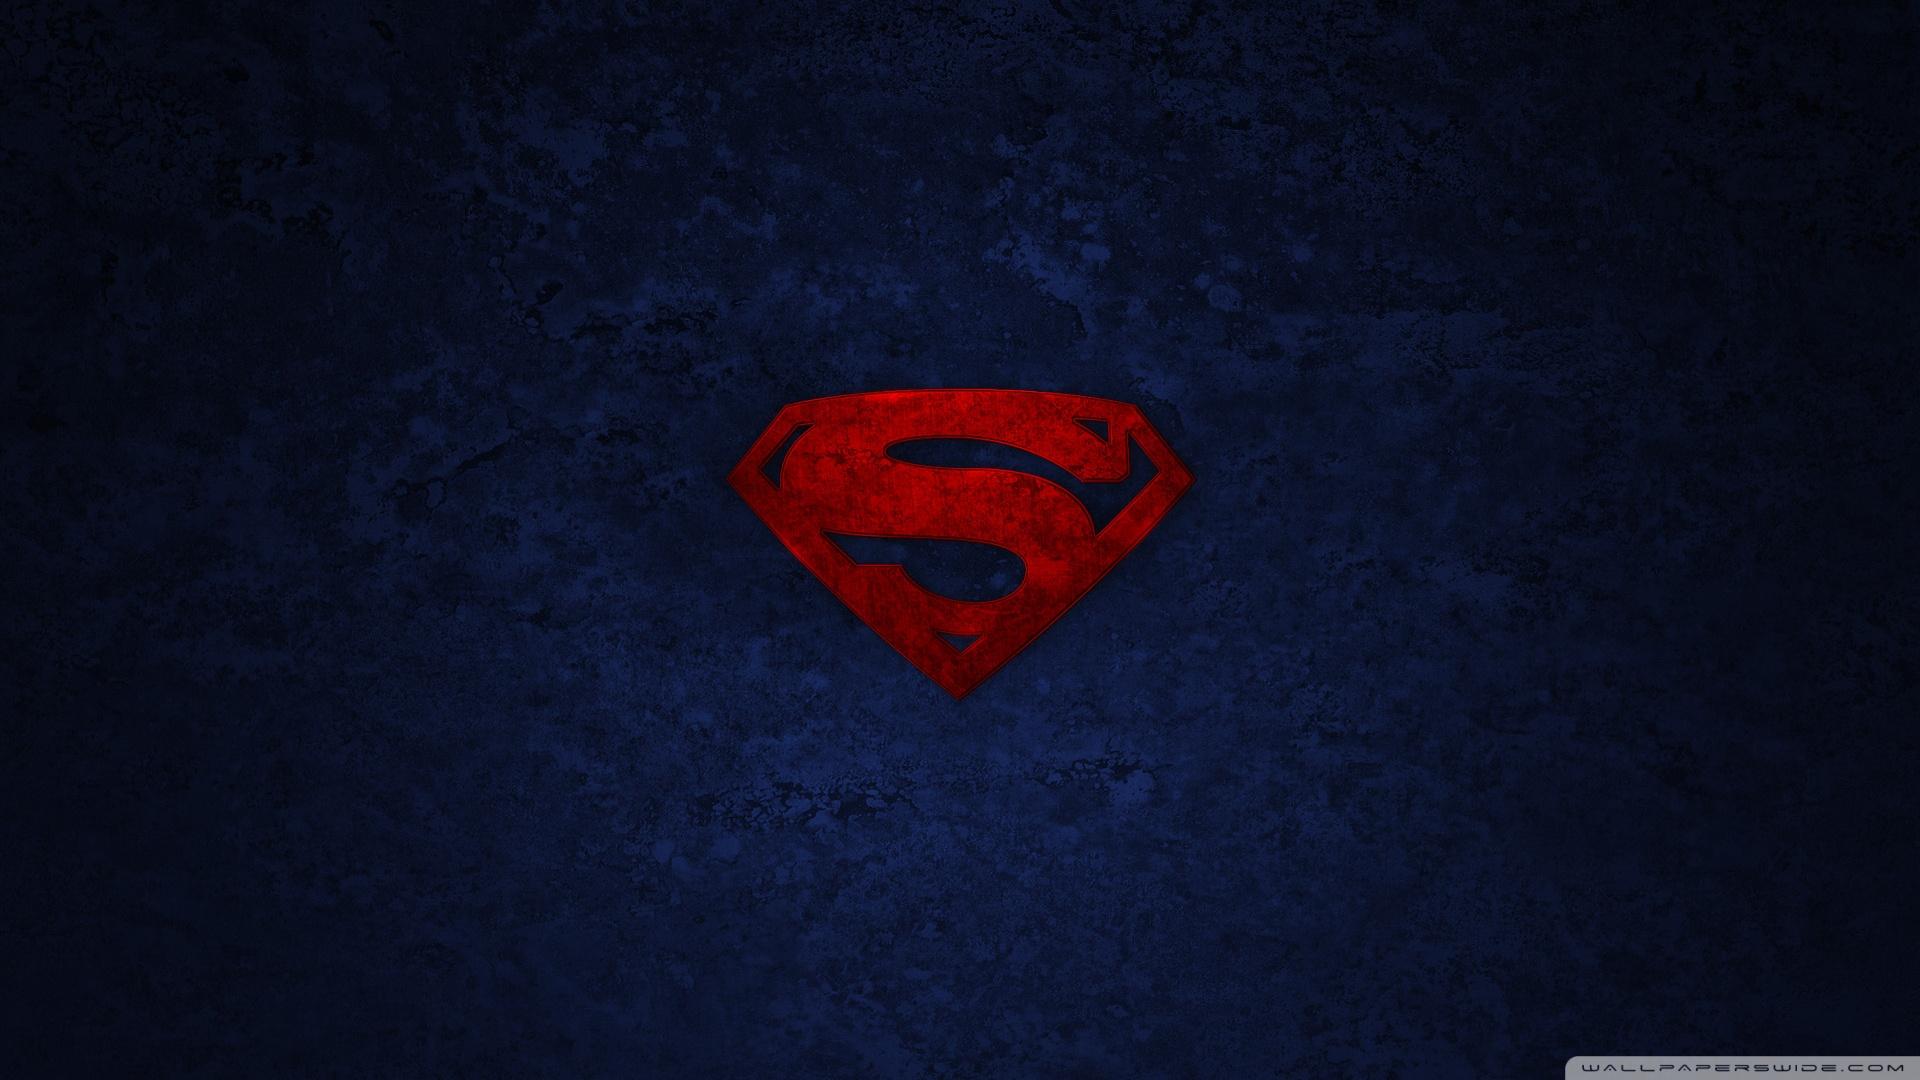 Superman Wallpaper 1920x1080 Superman 1920x1080